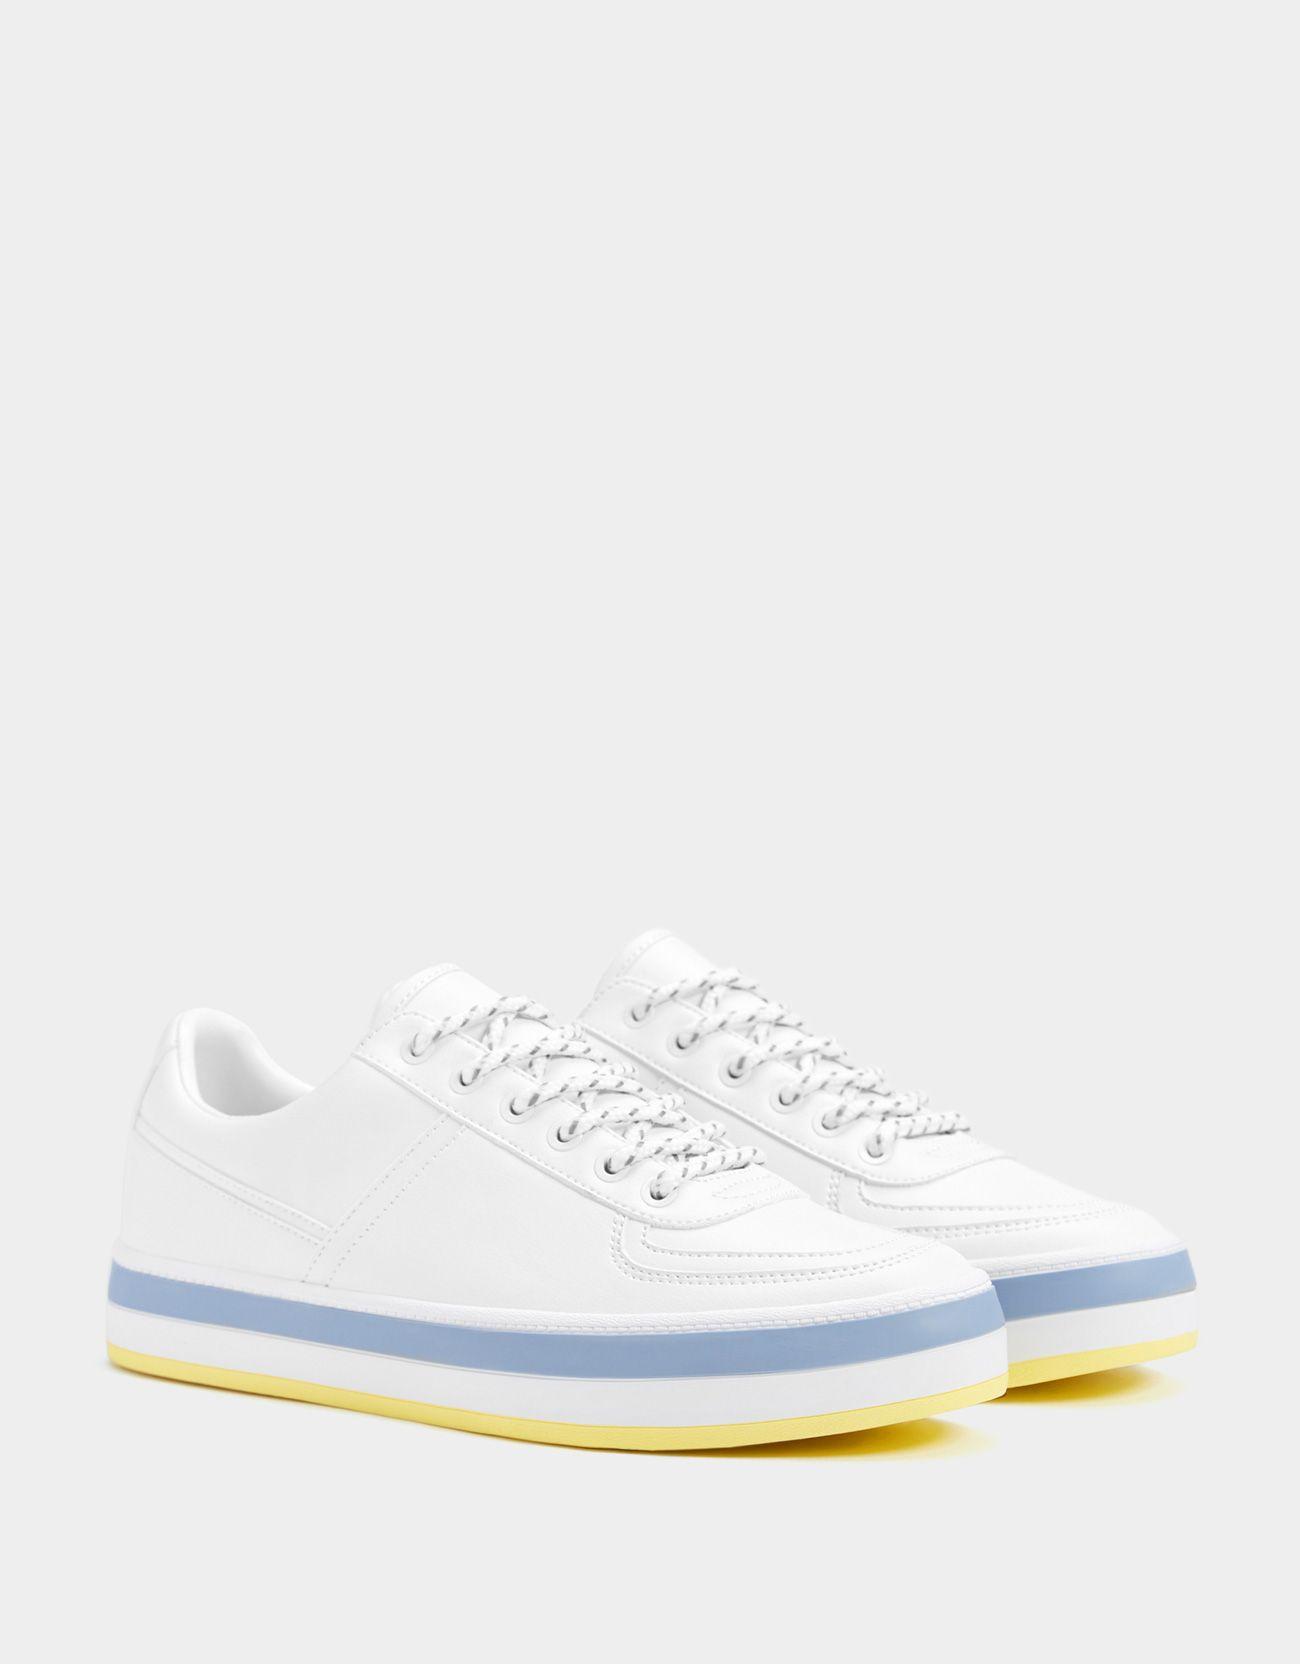 b8fa5d5a40fa کتونی سفید زنانه برشکا با کد 3067185 #کفش #اسنیکر Air Force Sneakers, Nike